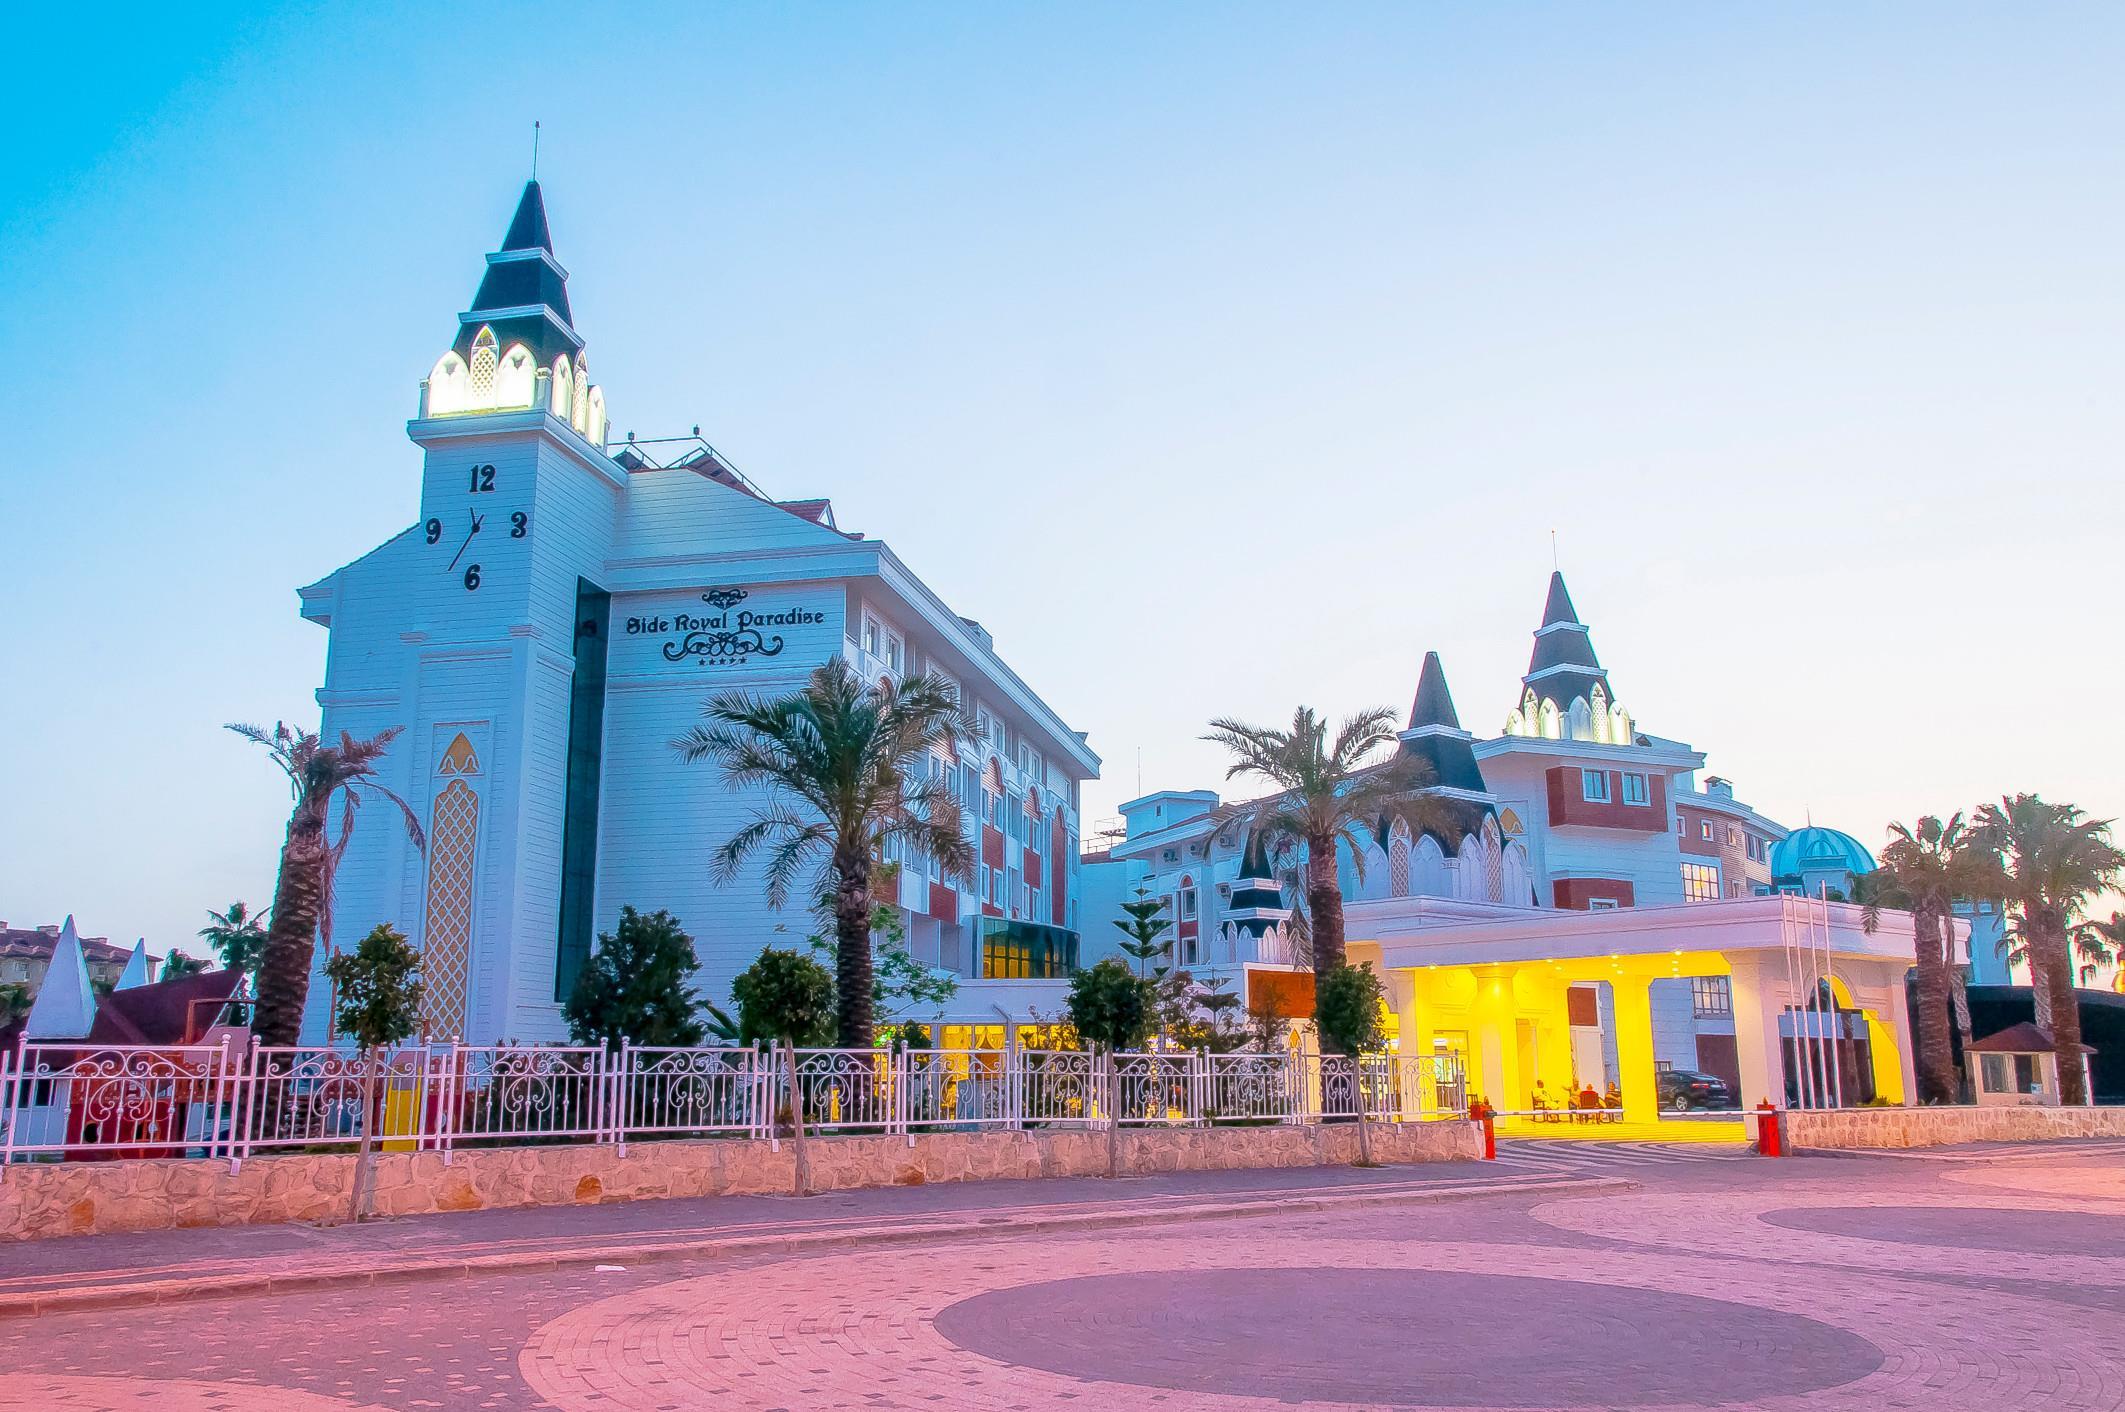 http://www.orextravel.sk/OREX/hotelphotos/side-royal-paradise-general-001.jpg